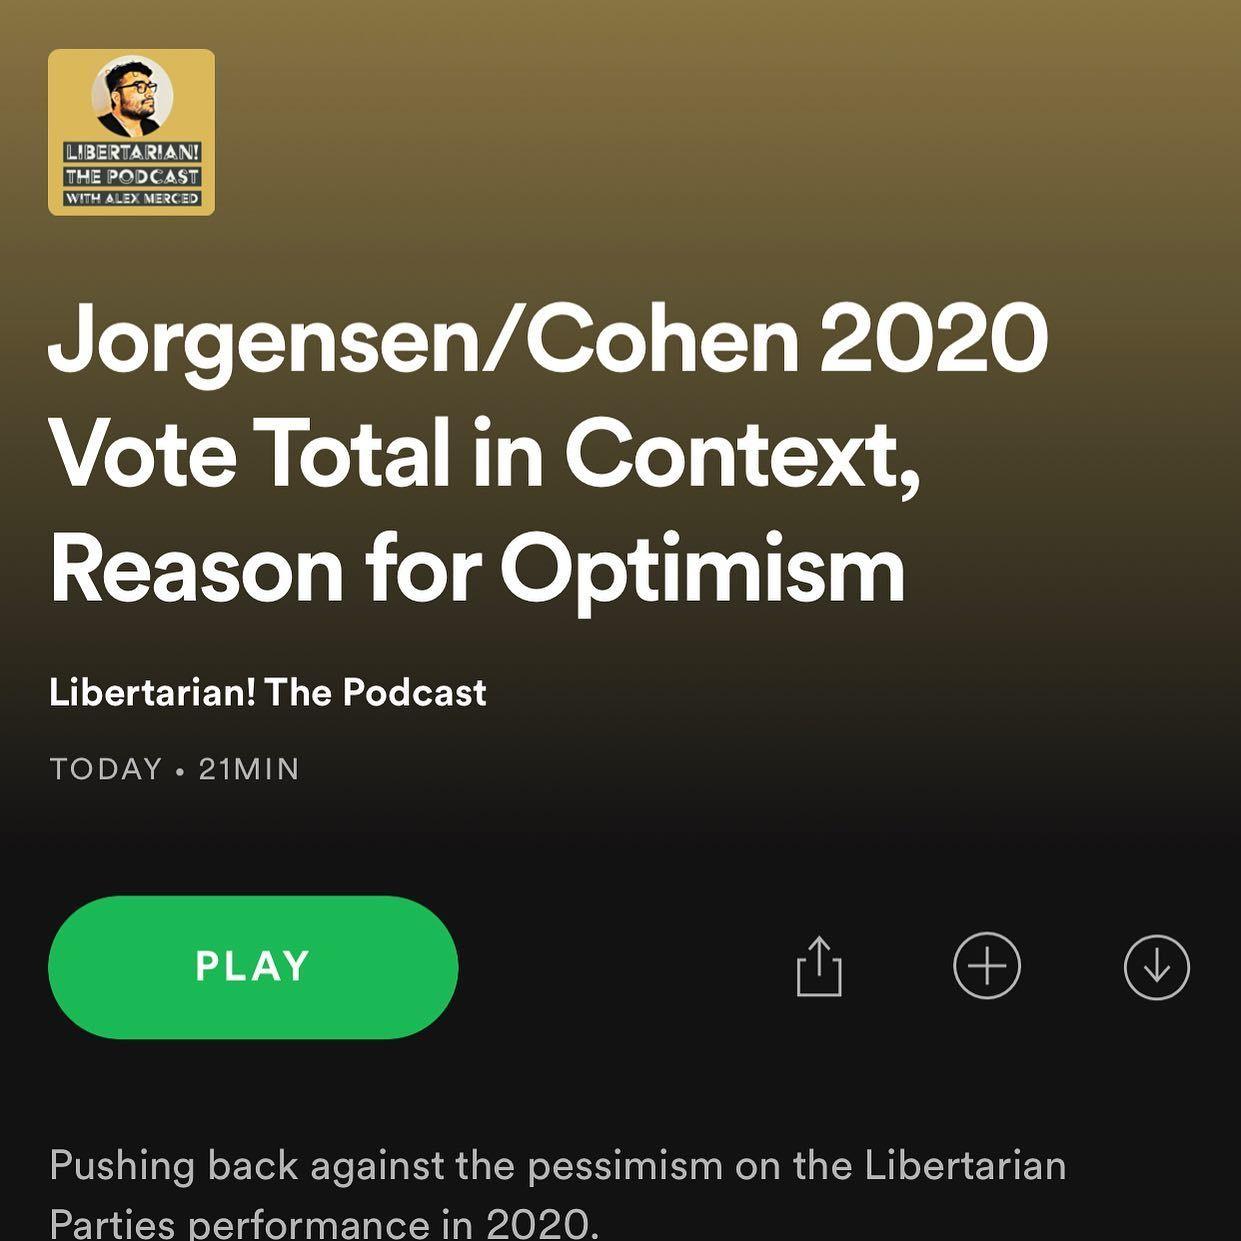 120 Libertarian Images Ideas In 2021 Libertarian Merced Image